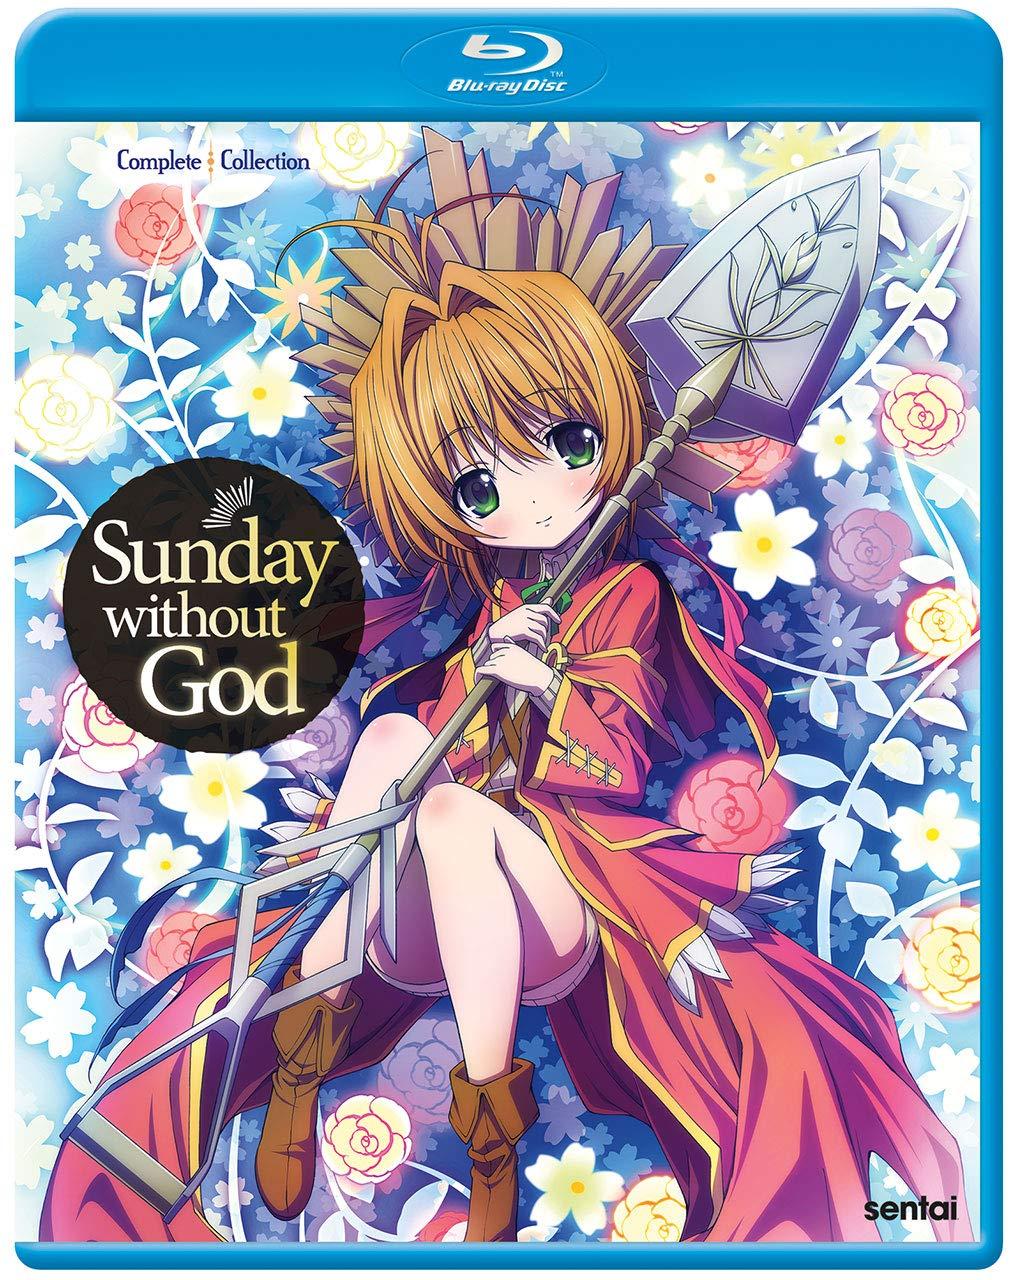 North America Anime Blu-ray/DVD Release, April 6